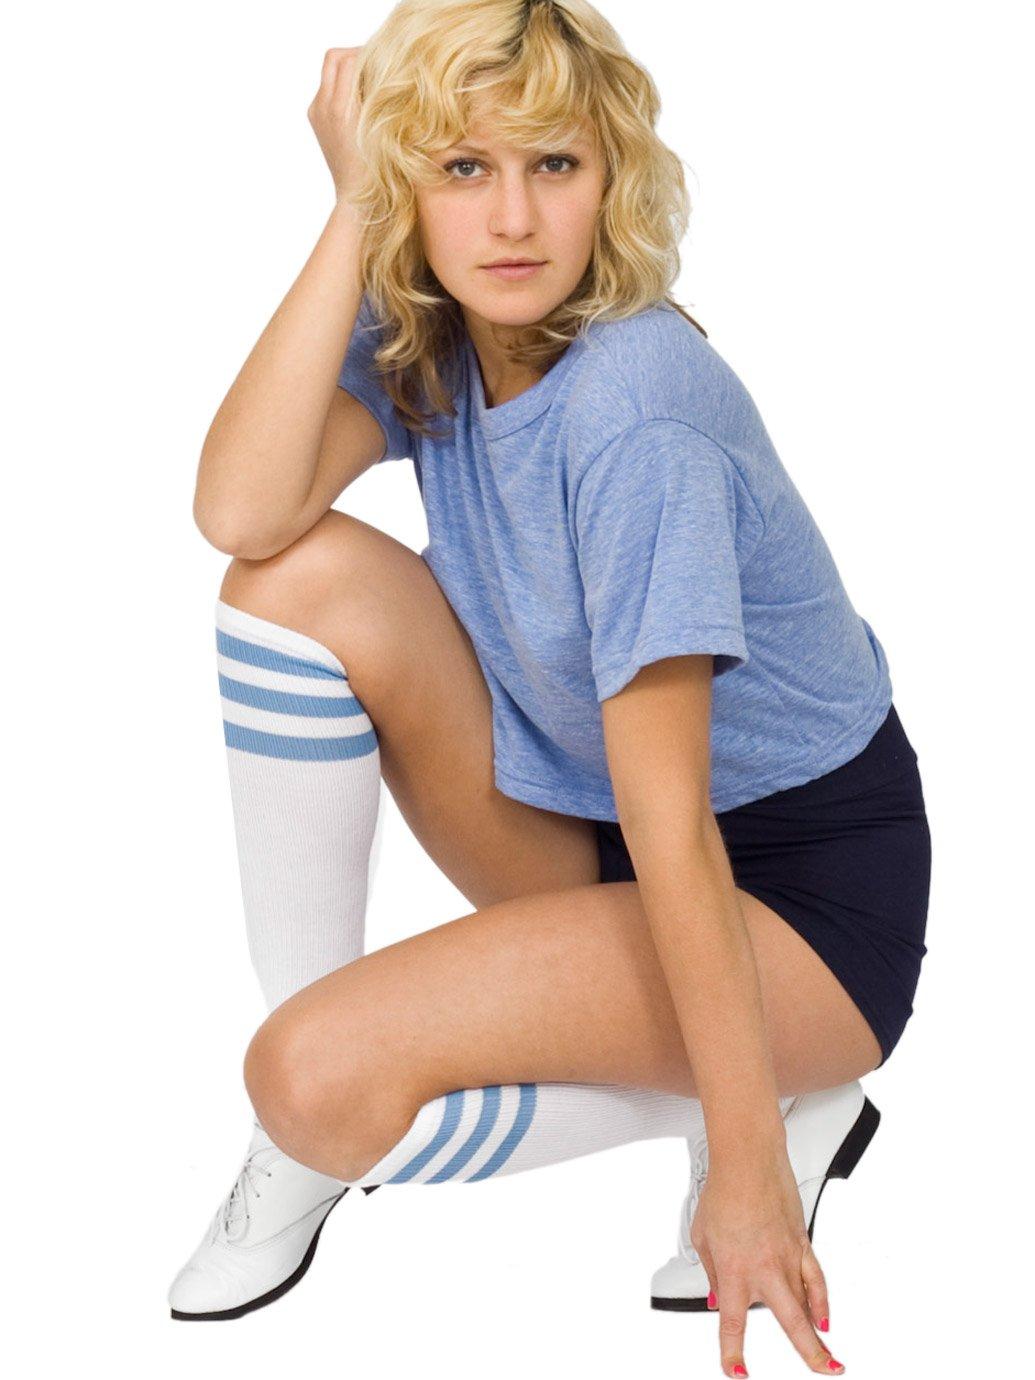 c6b909af35 American Apparel Stripe Knee-High Socks - Evan Webster INK